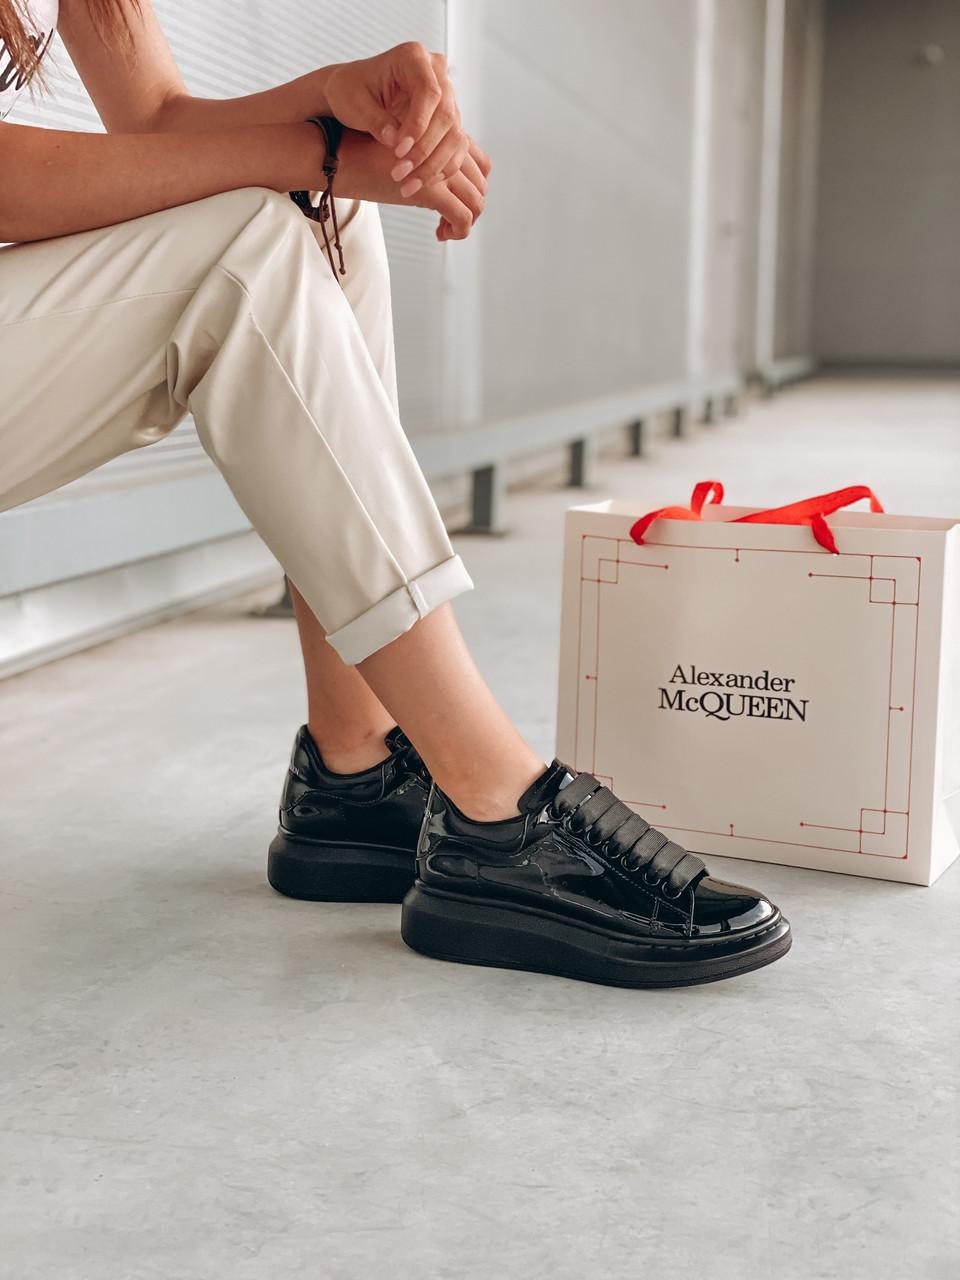 Стильні кросівки Alexander McQueen (Олександр Маквин) Light Beige Patent LUX QUALITY